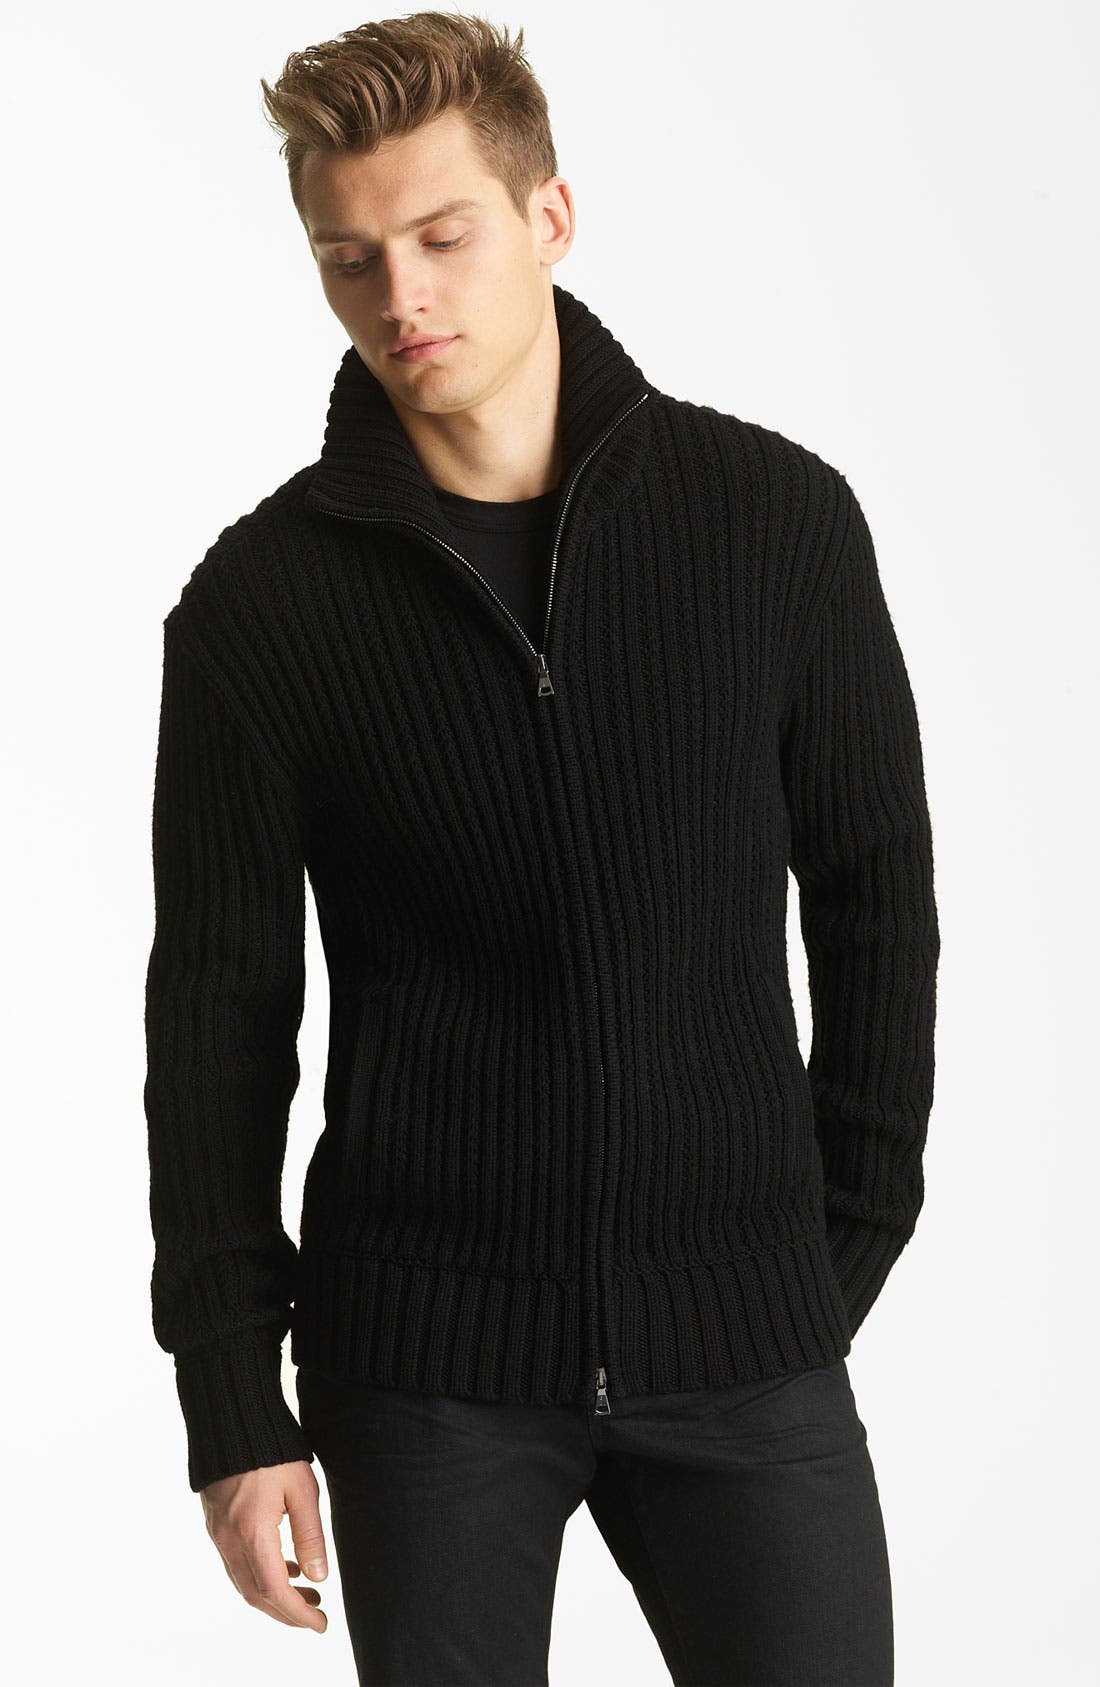 Alternate Image 1 Selected - John Varvatos Collection Zip Knit Sweater